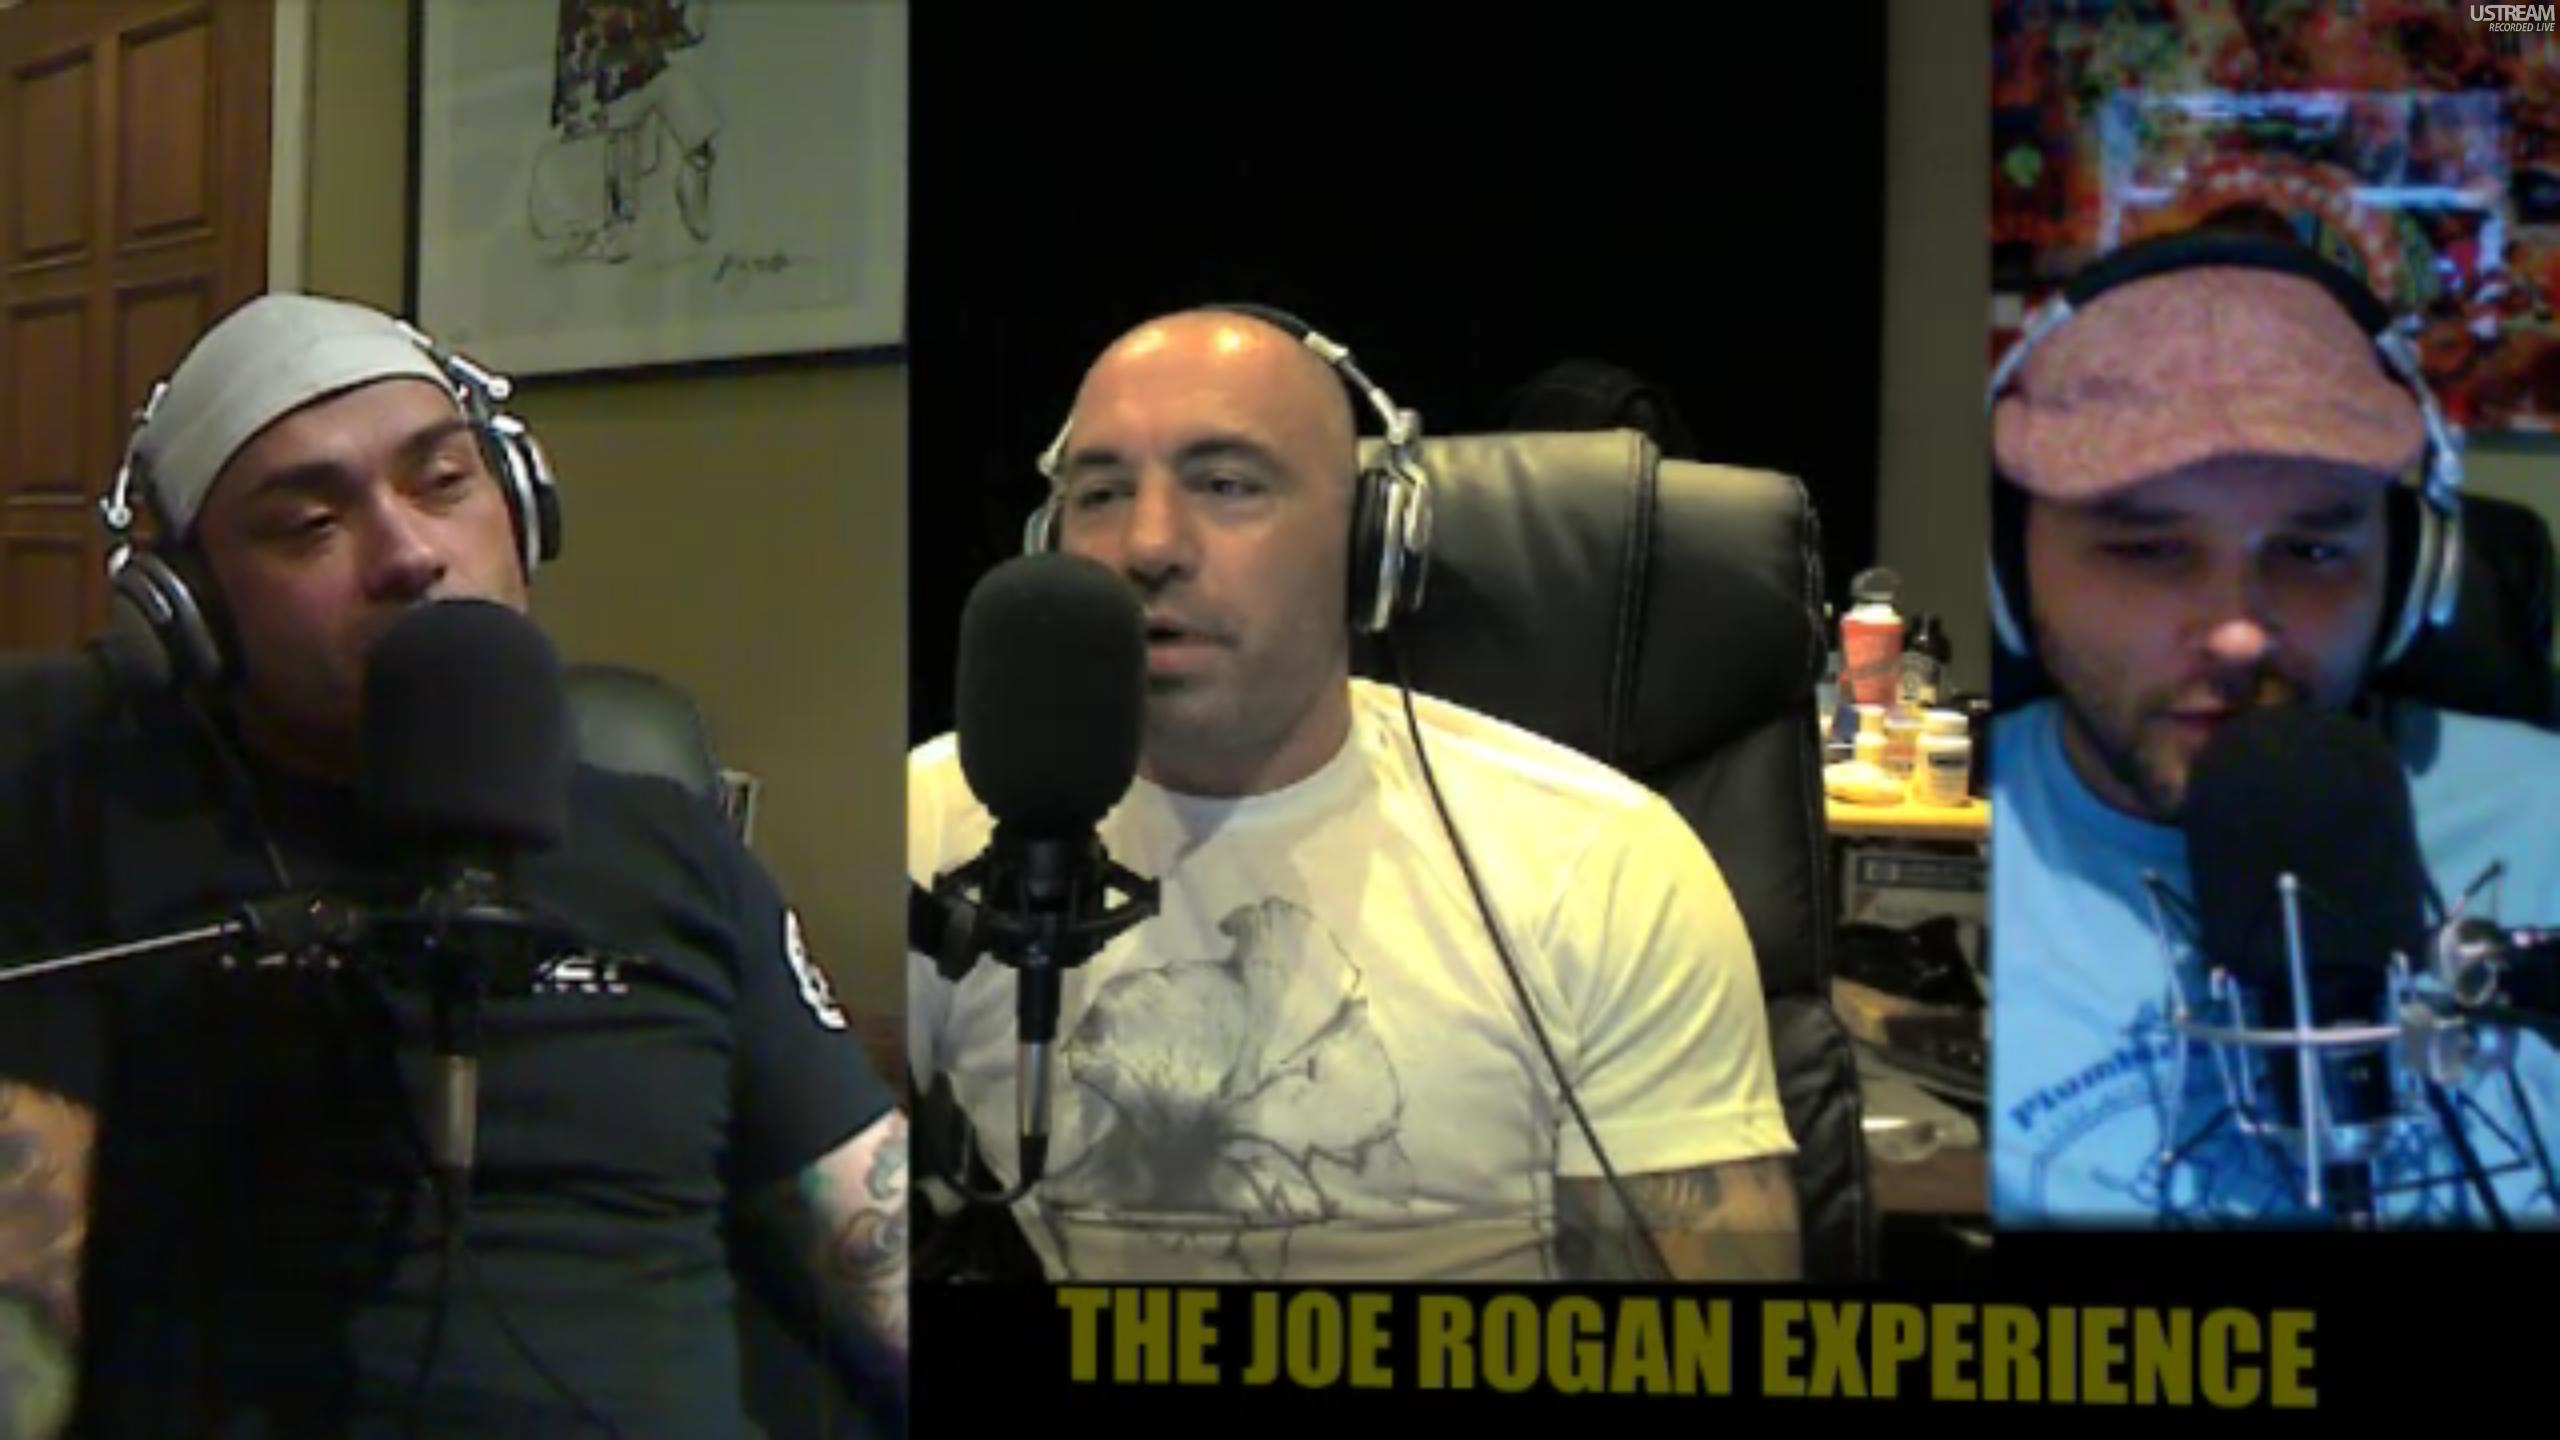 The Joe Rogan Experience #236 - Eddie Bravo, Brian Redban